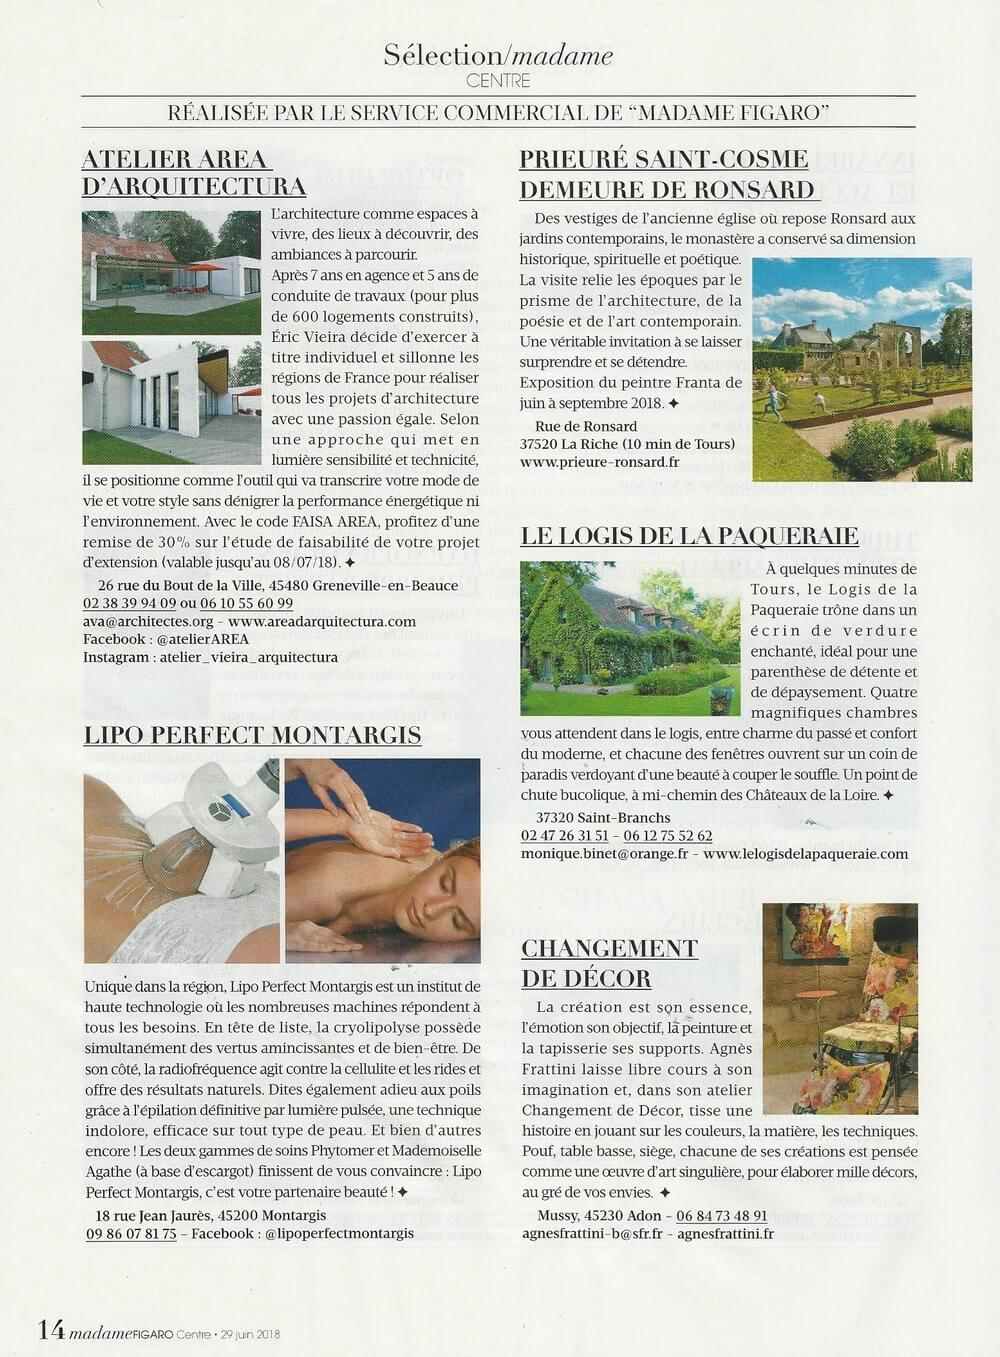 Contenu article de presse sur Atelier Area architecture